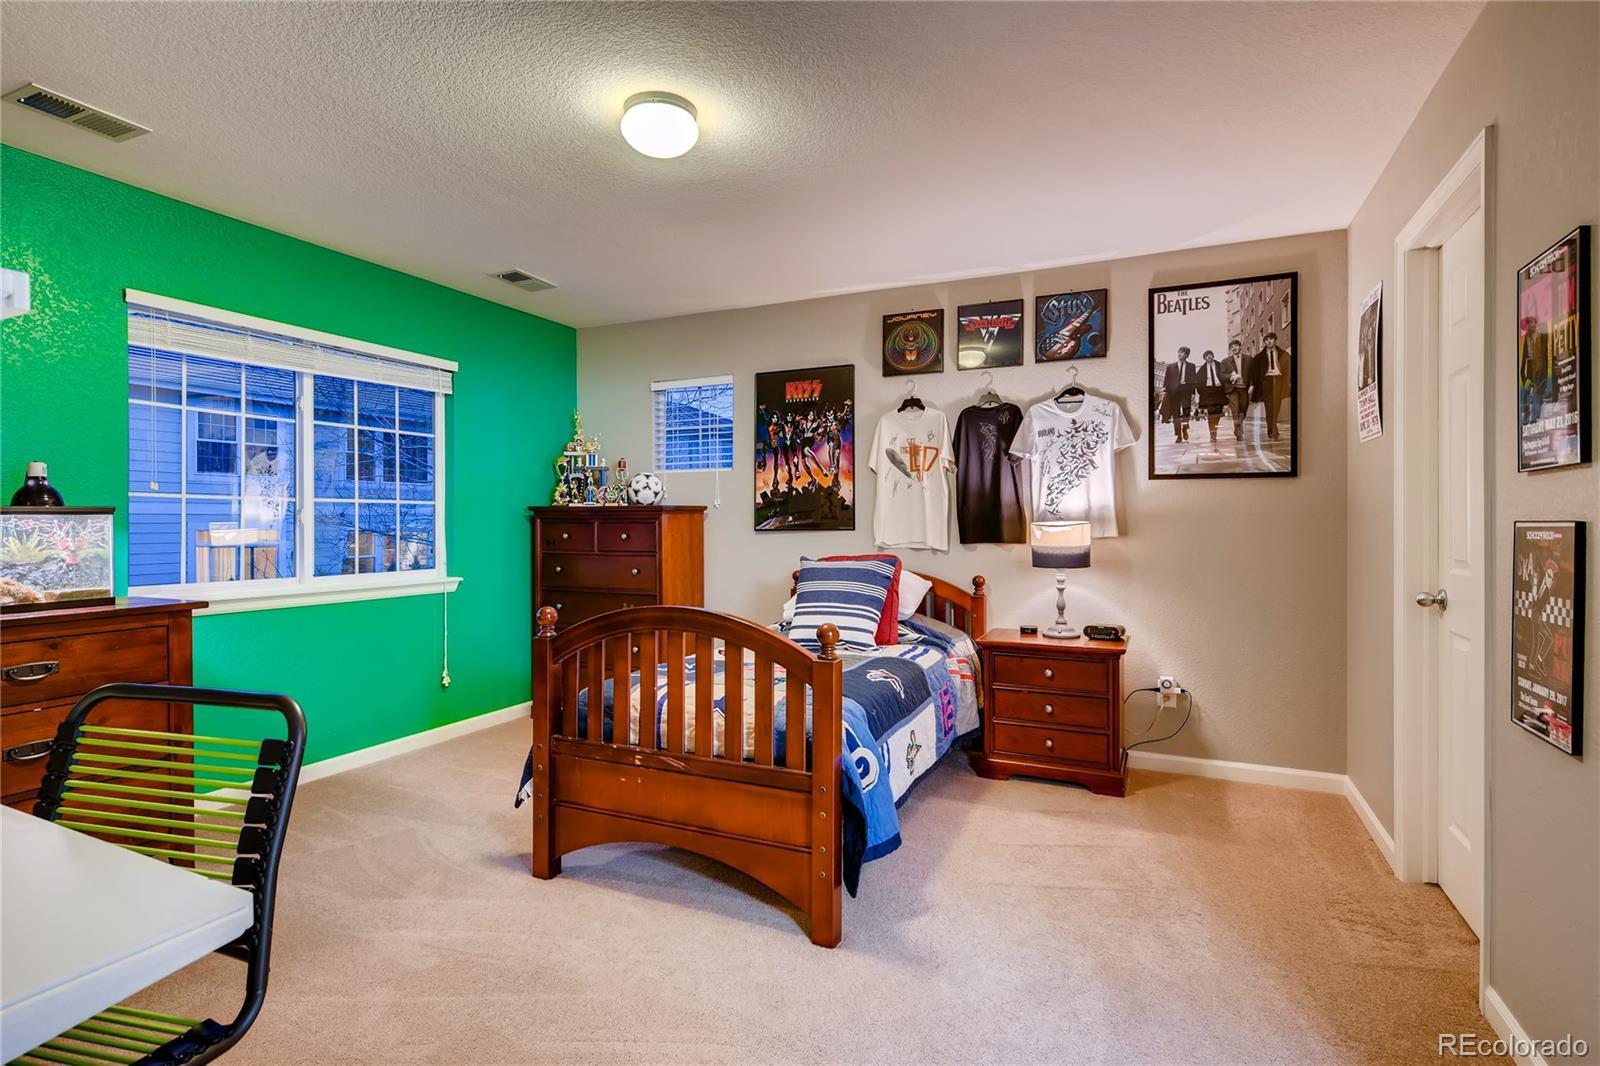 MLS# 7926398 - 21 - 6075 S Paris Street, Greenwood Village, CO 80111